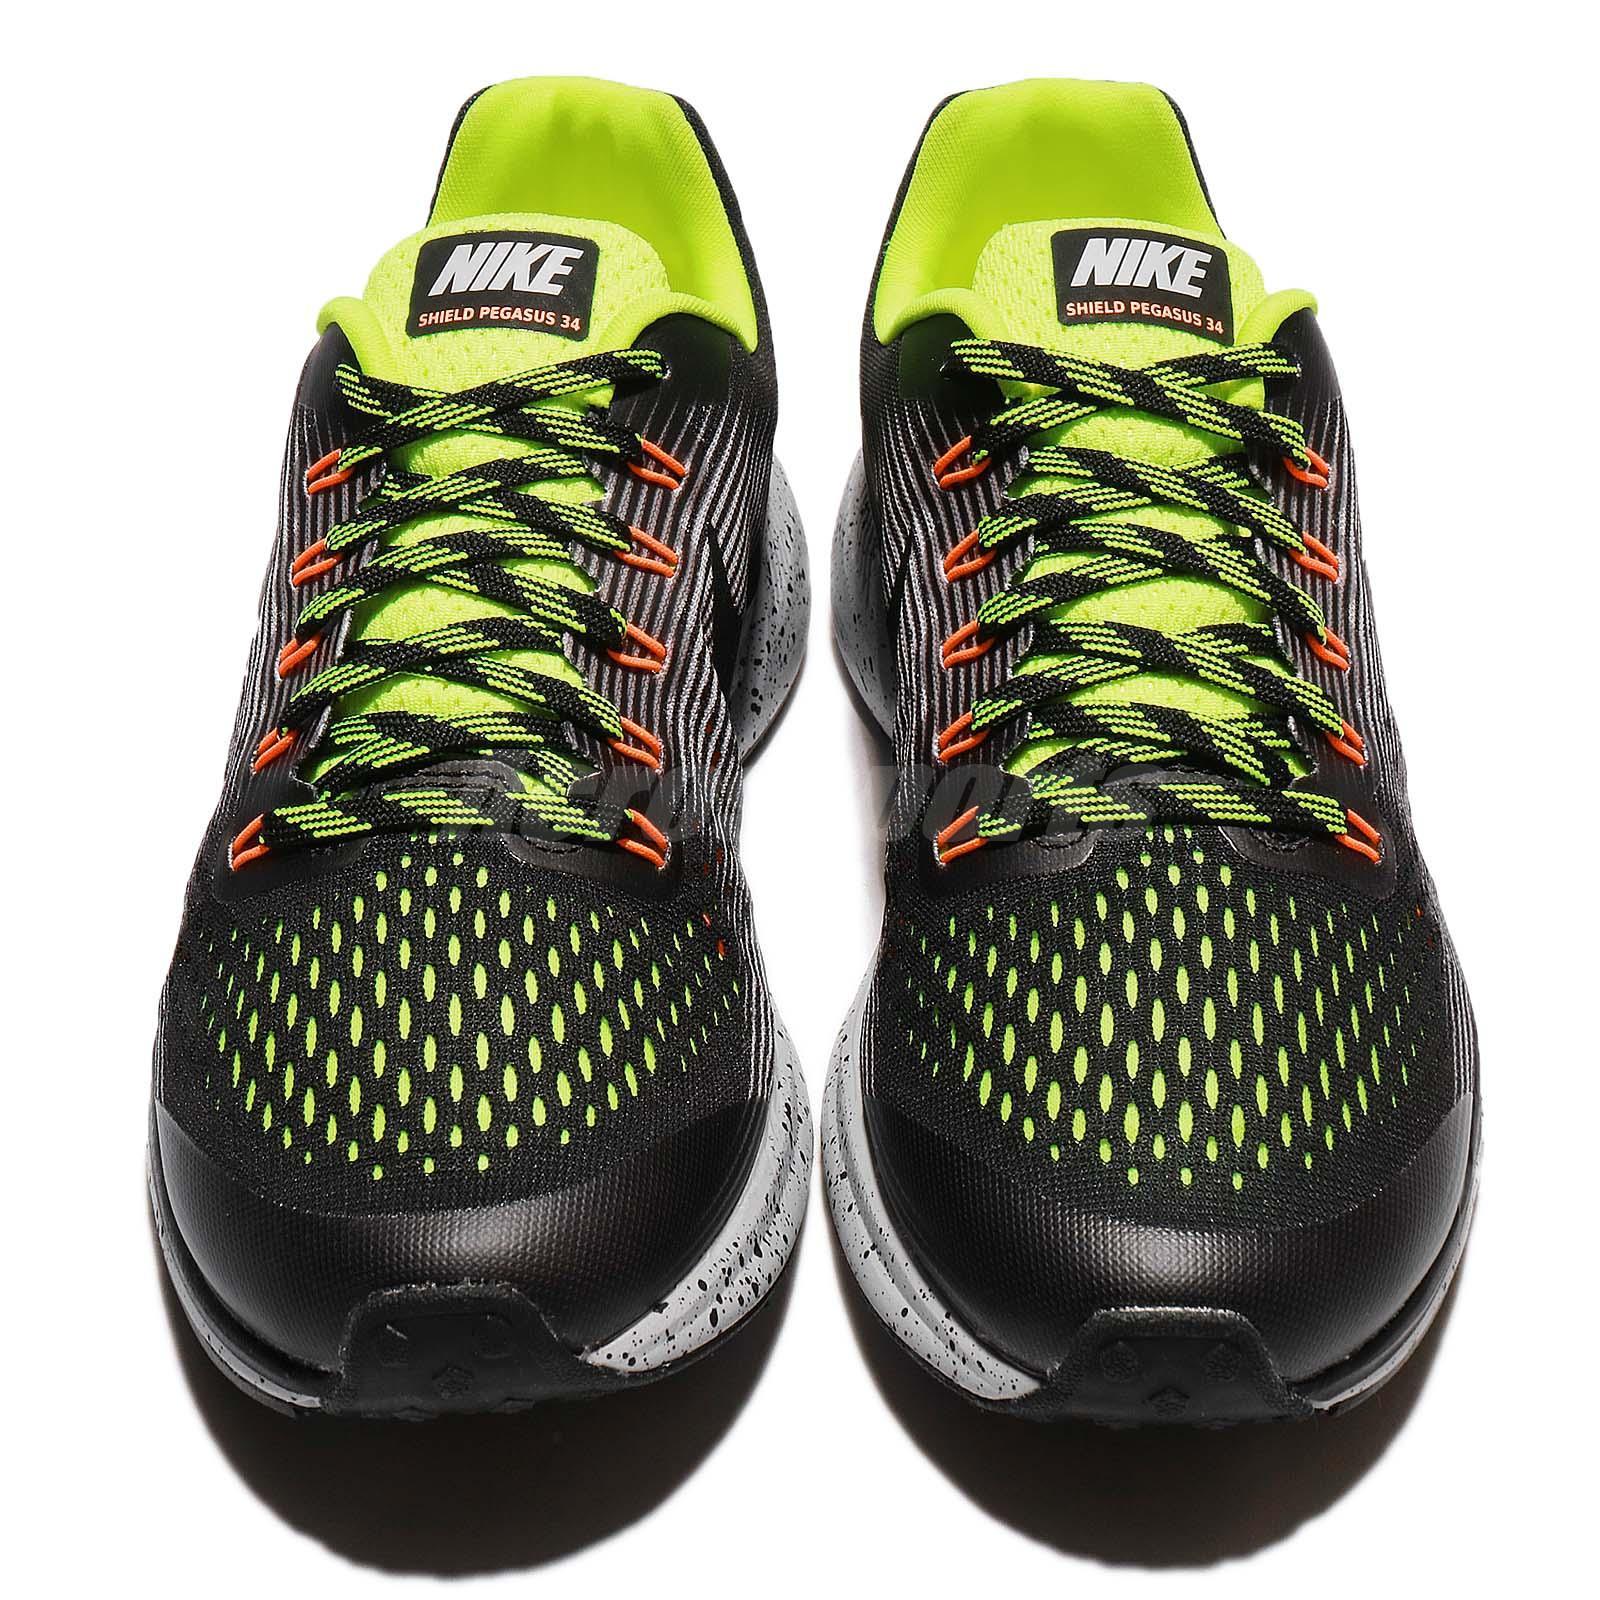 878c9aa29def Nike Zoom Pegasus 34 Shield GS Water Repel Black Volt Kids Running ...